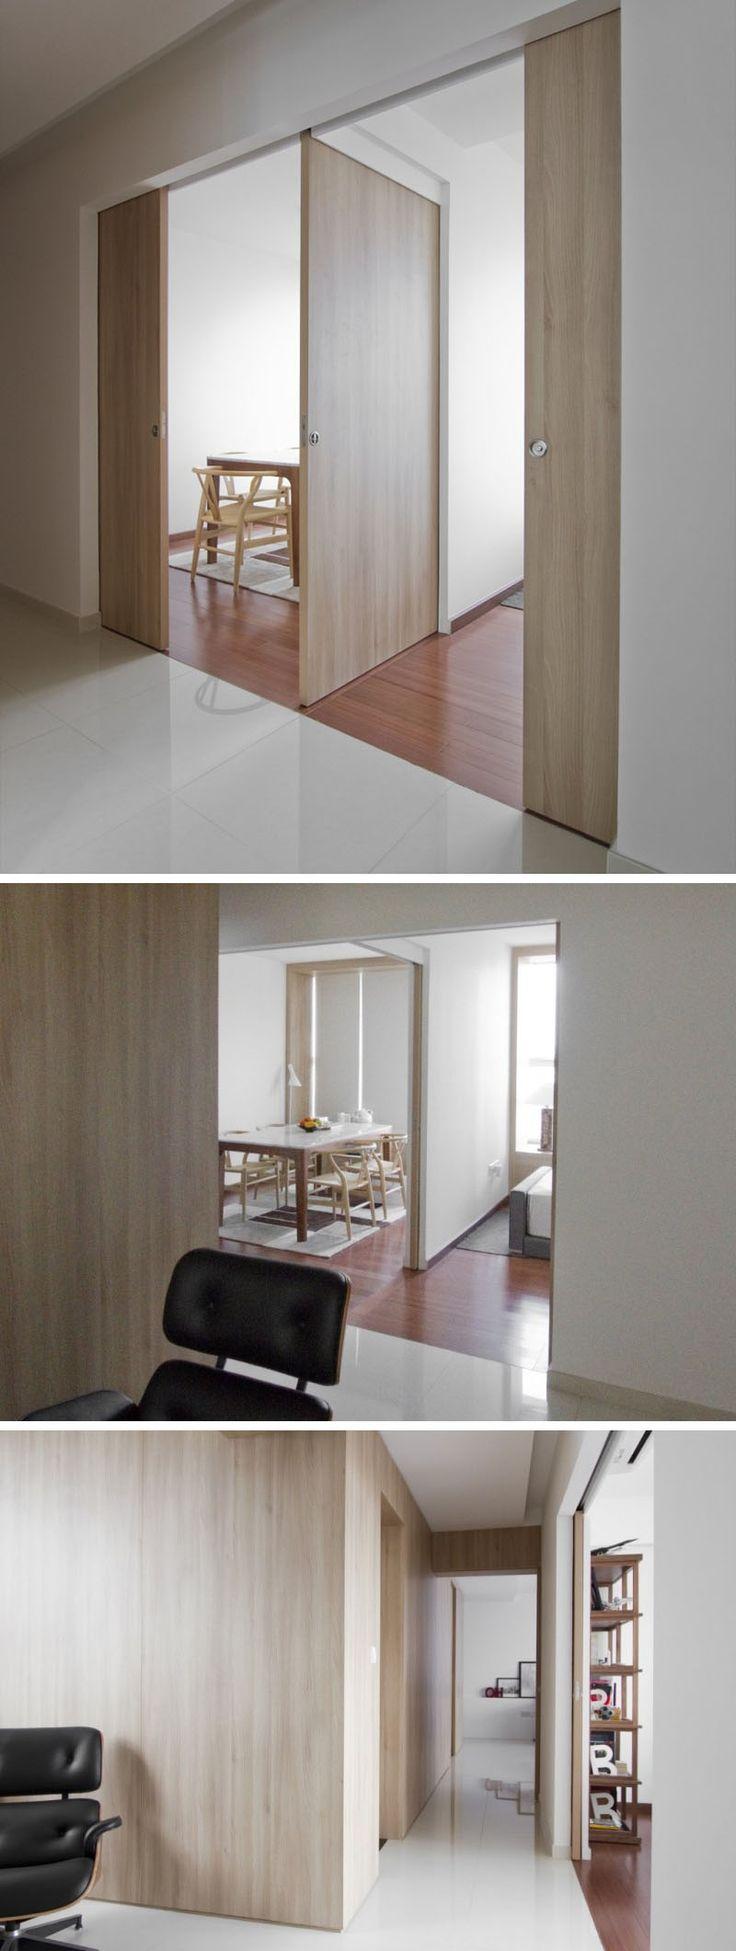 Alternative Home Designs Impressive Inspiration